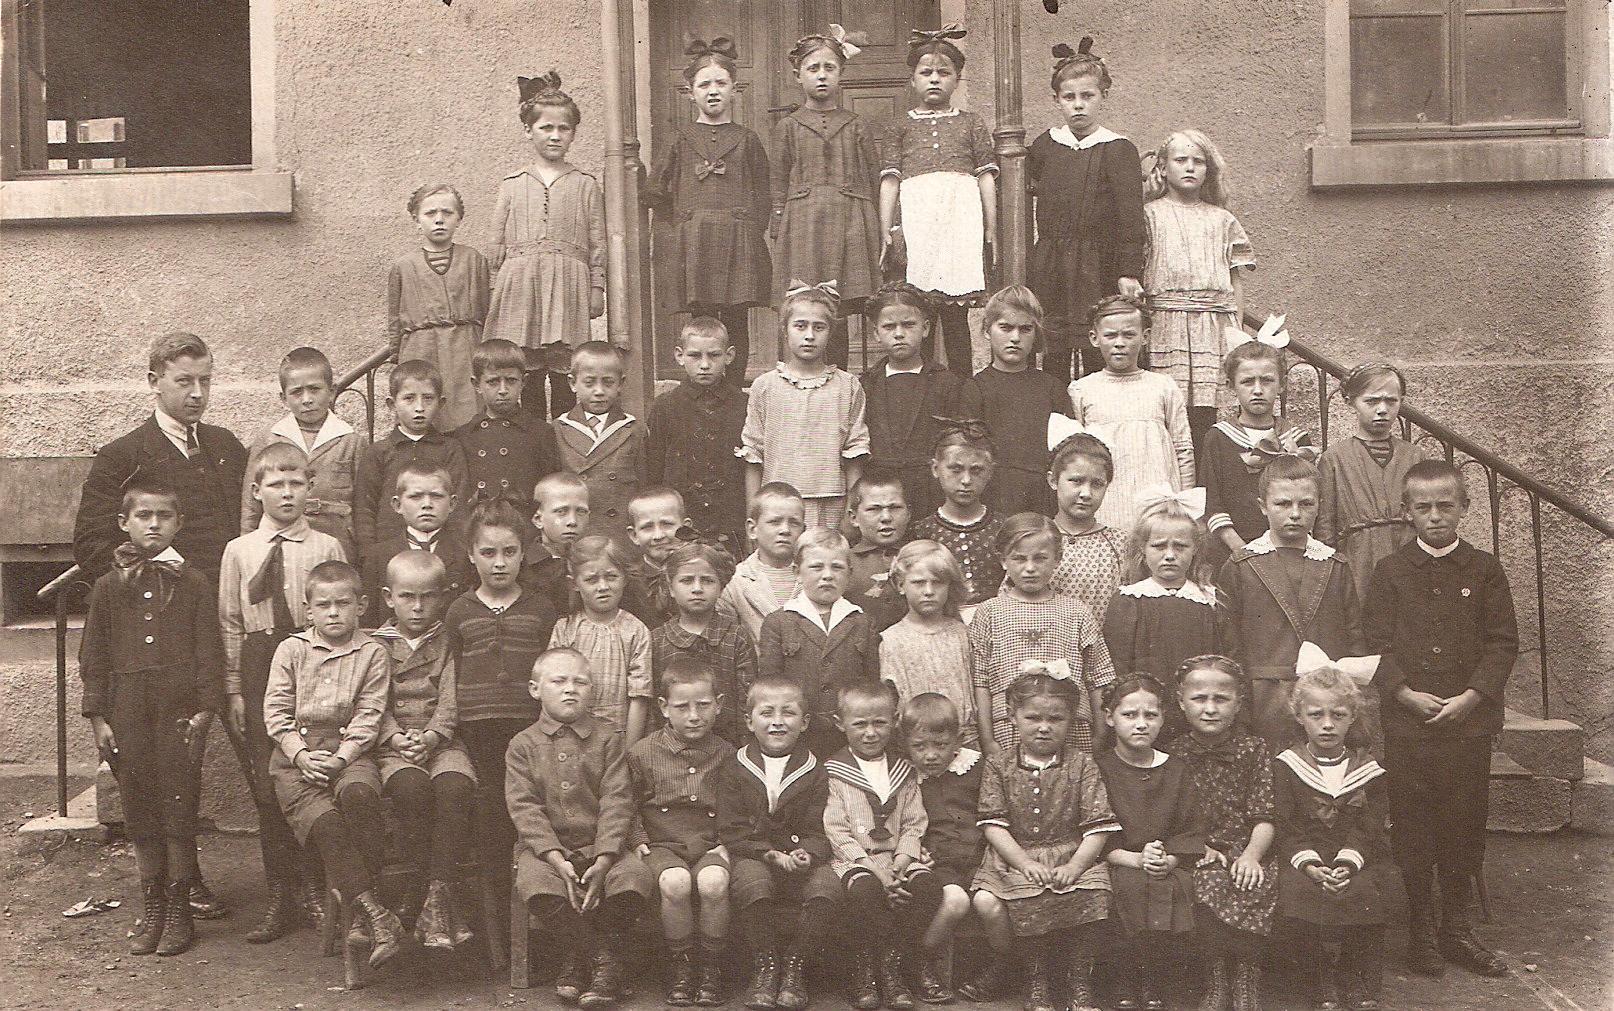 Jahrgang 1915, Bild:Fritzel,Ursula geb.Faust